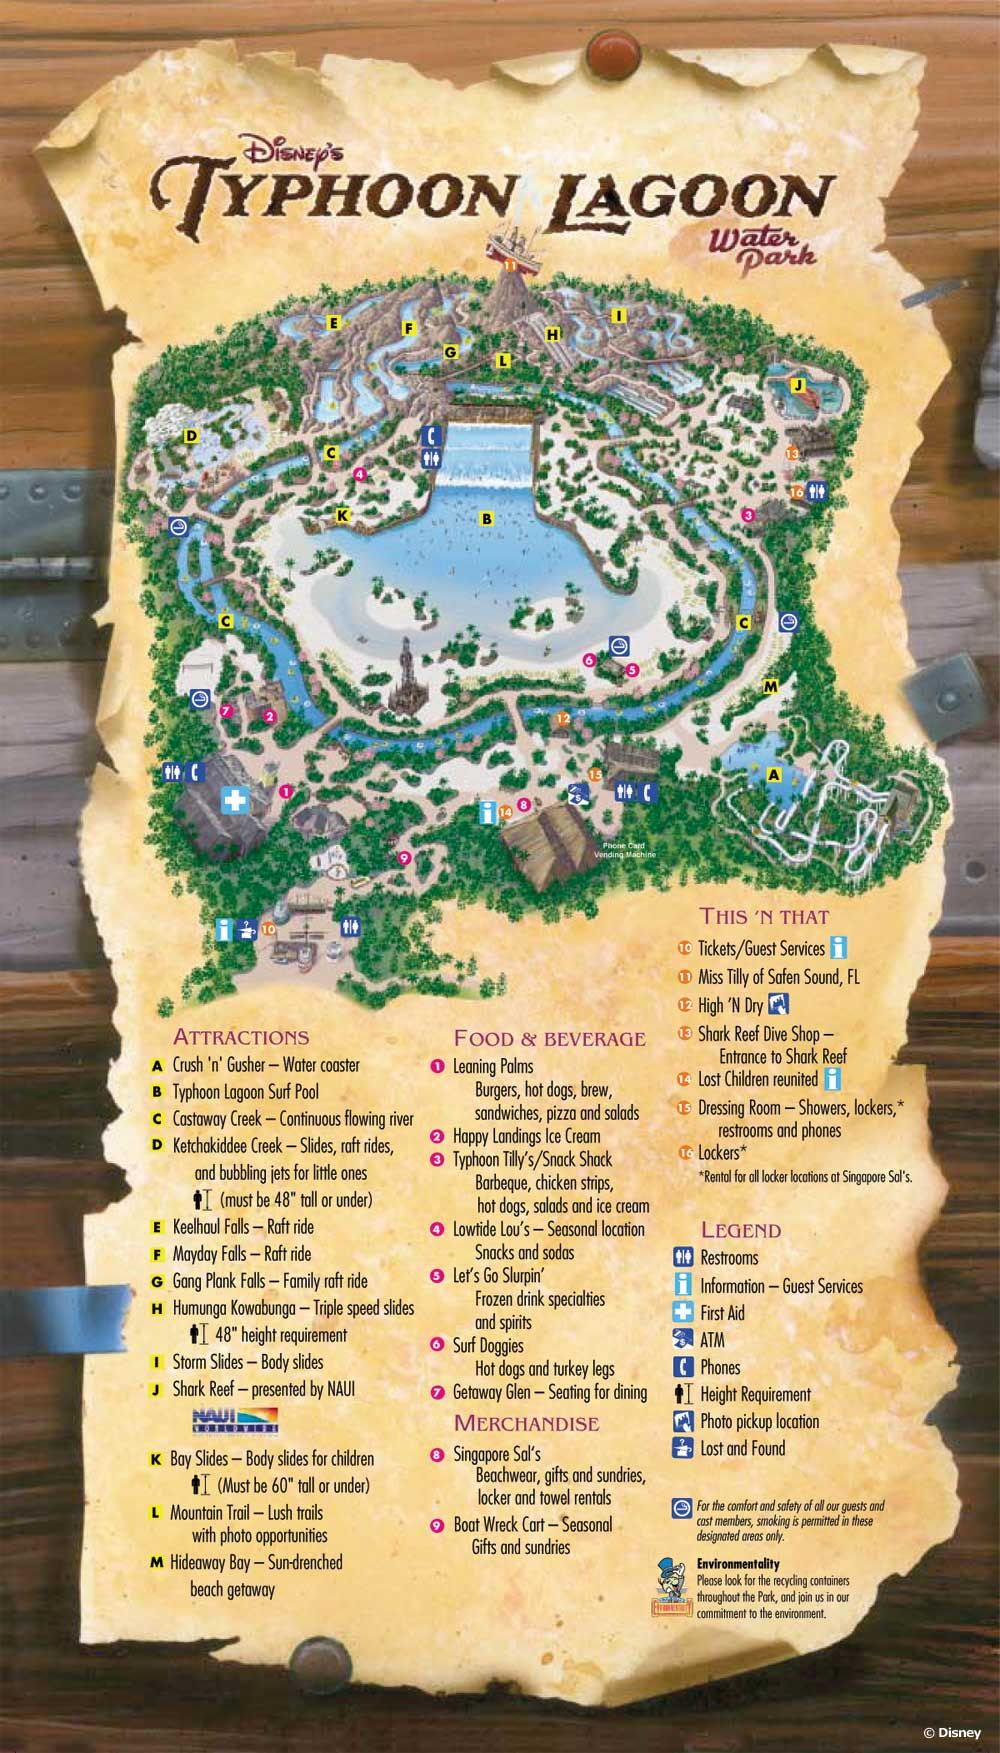 43754de42b7a2 Disney's Typhoon Lagoon Water Park map | Disney movies, Online Disney  movies, New Disney Movies